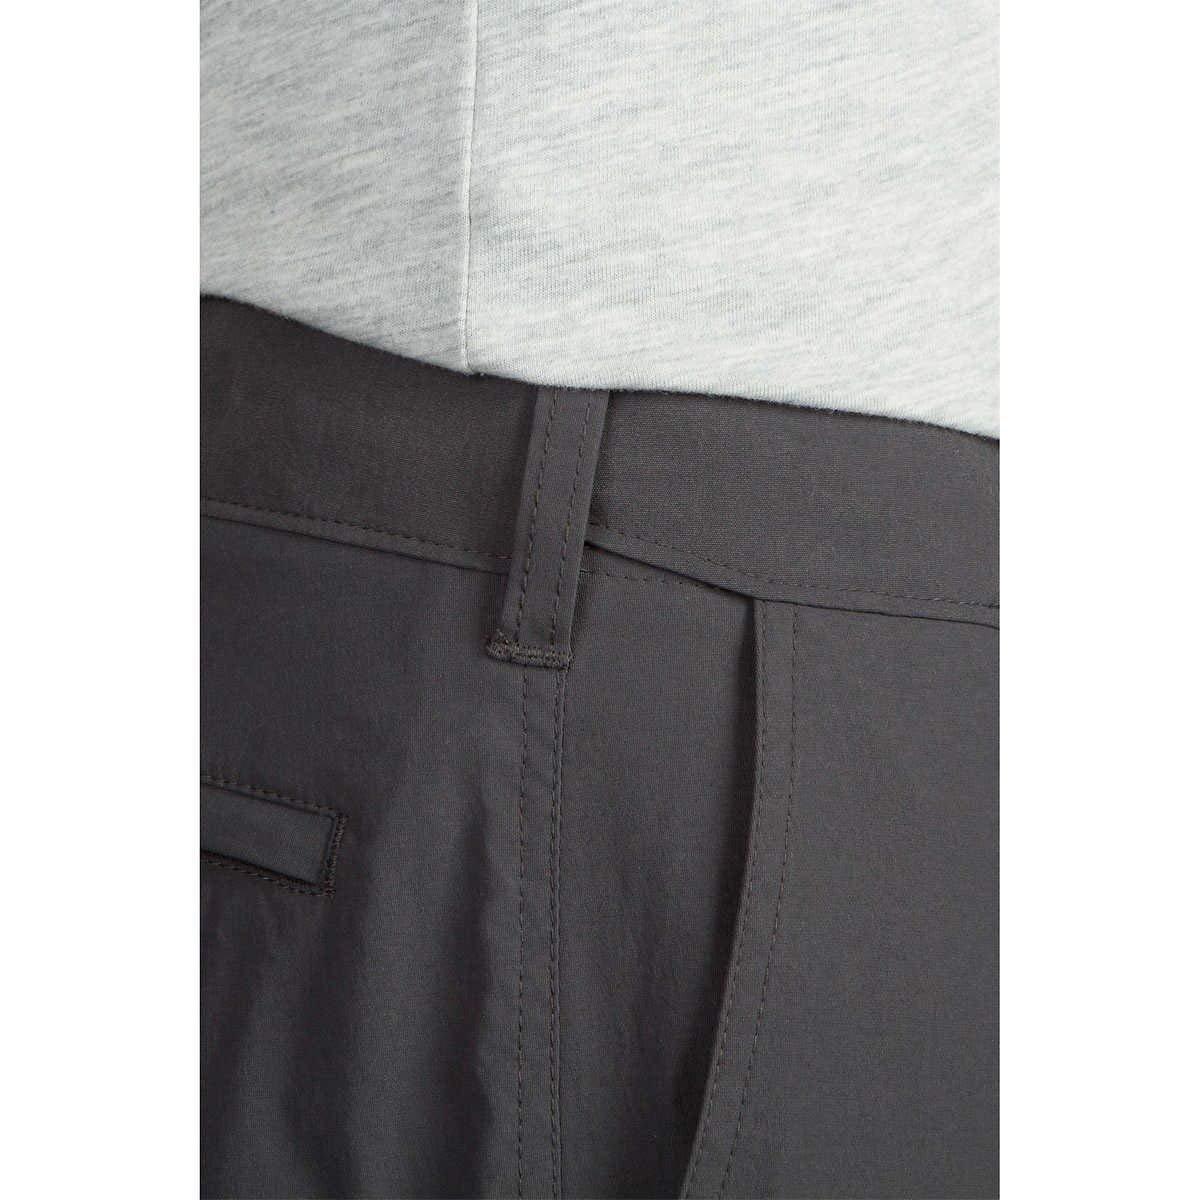 UB Tech by UnionBay Mens Classic Fit Comfort Waist Chino Pants